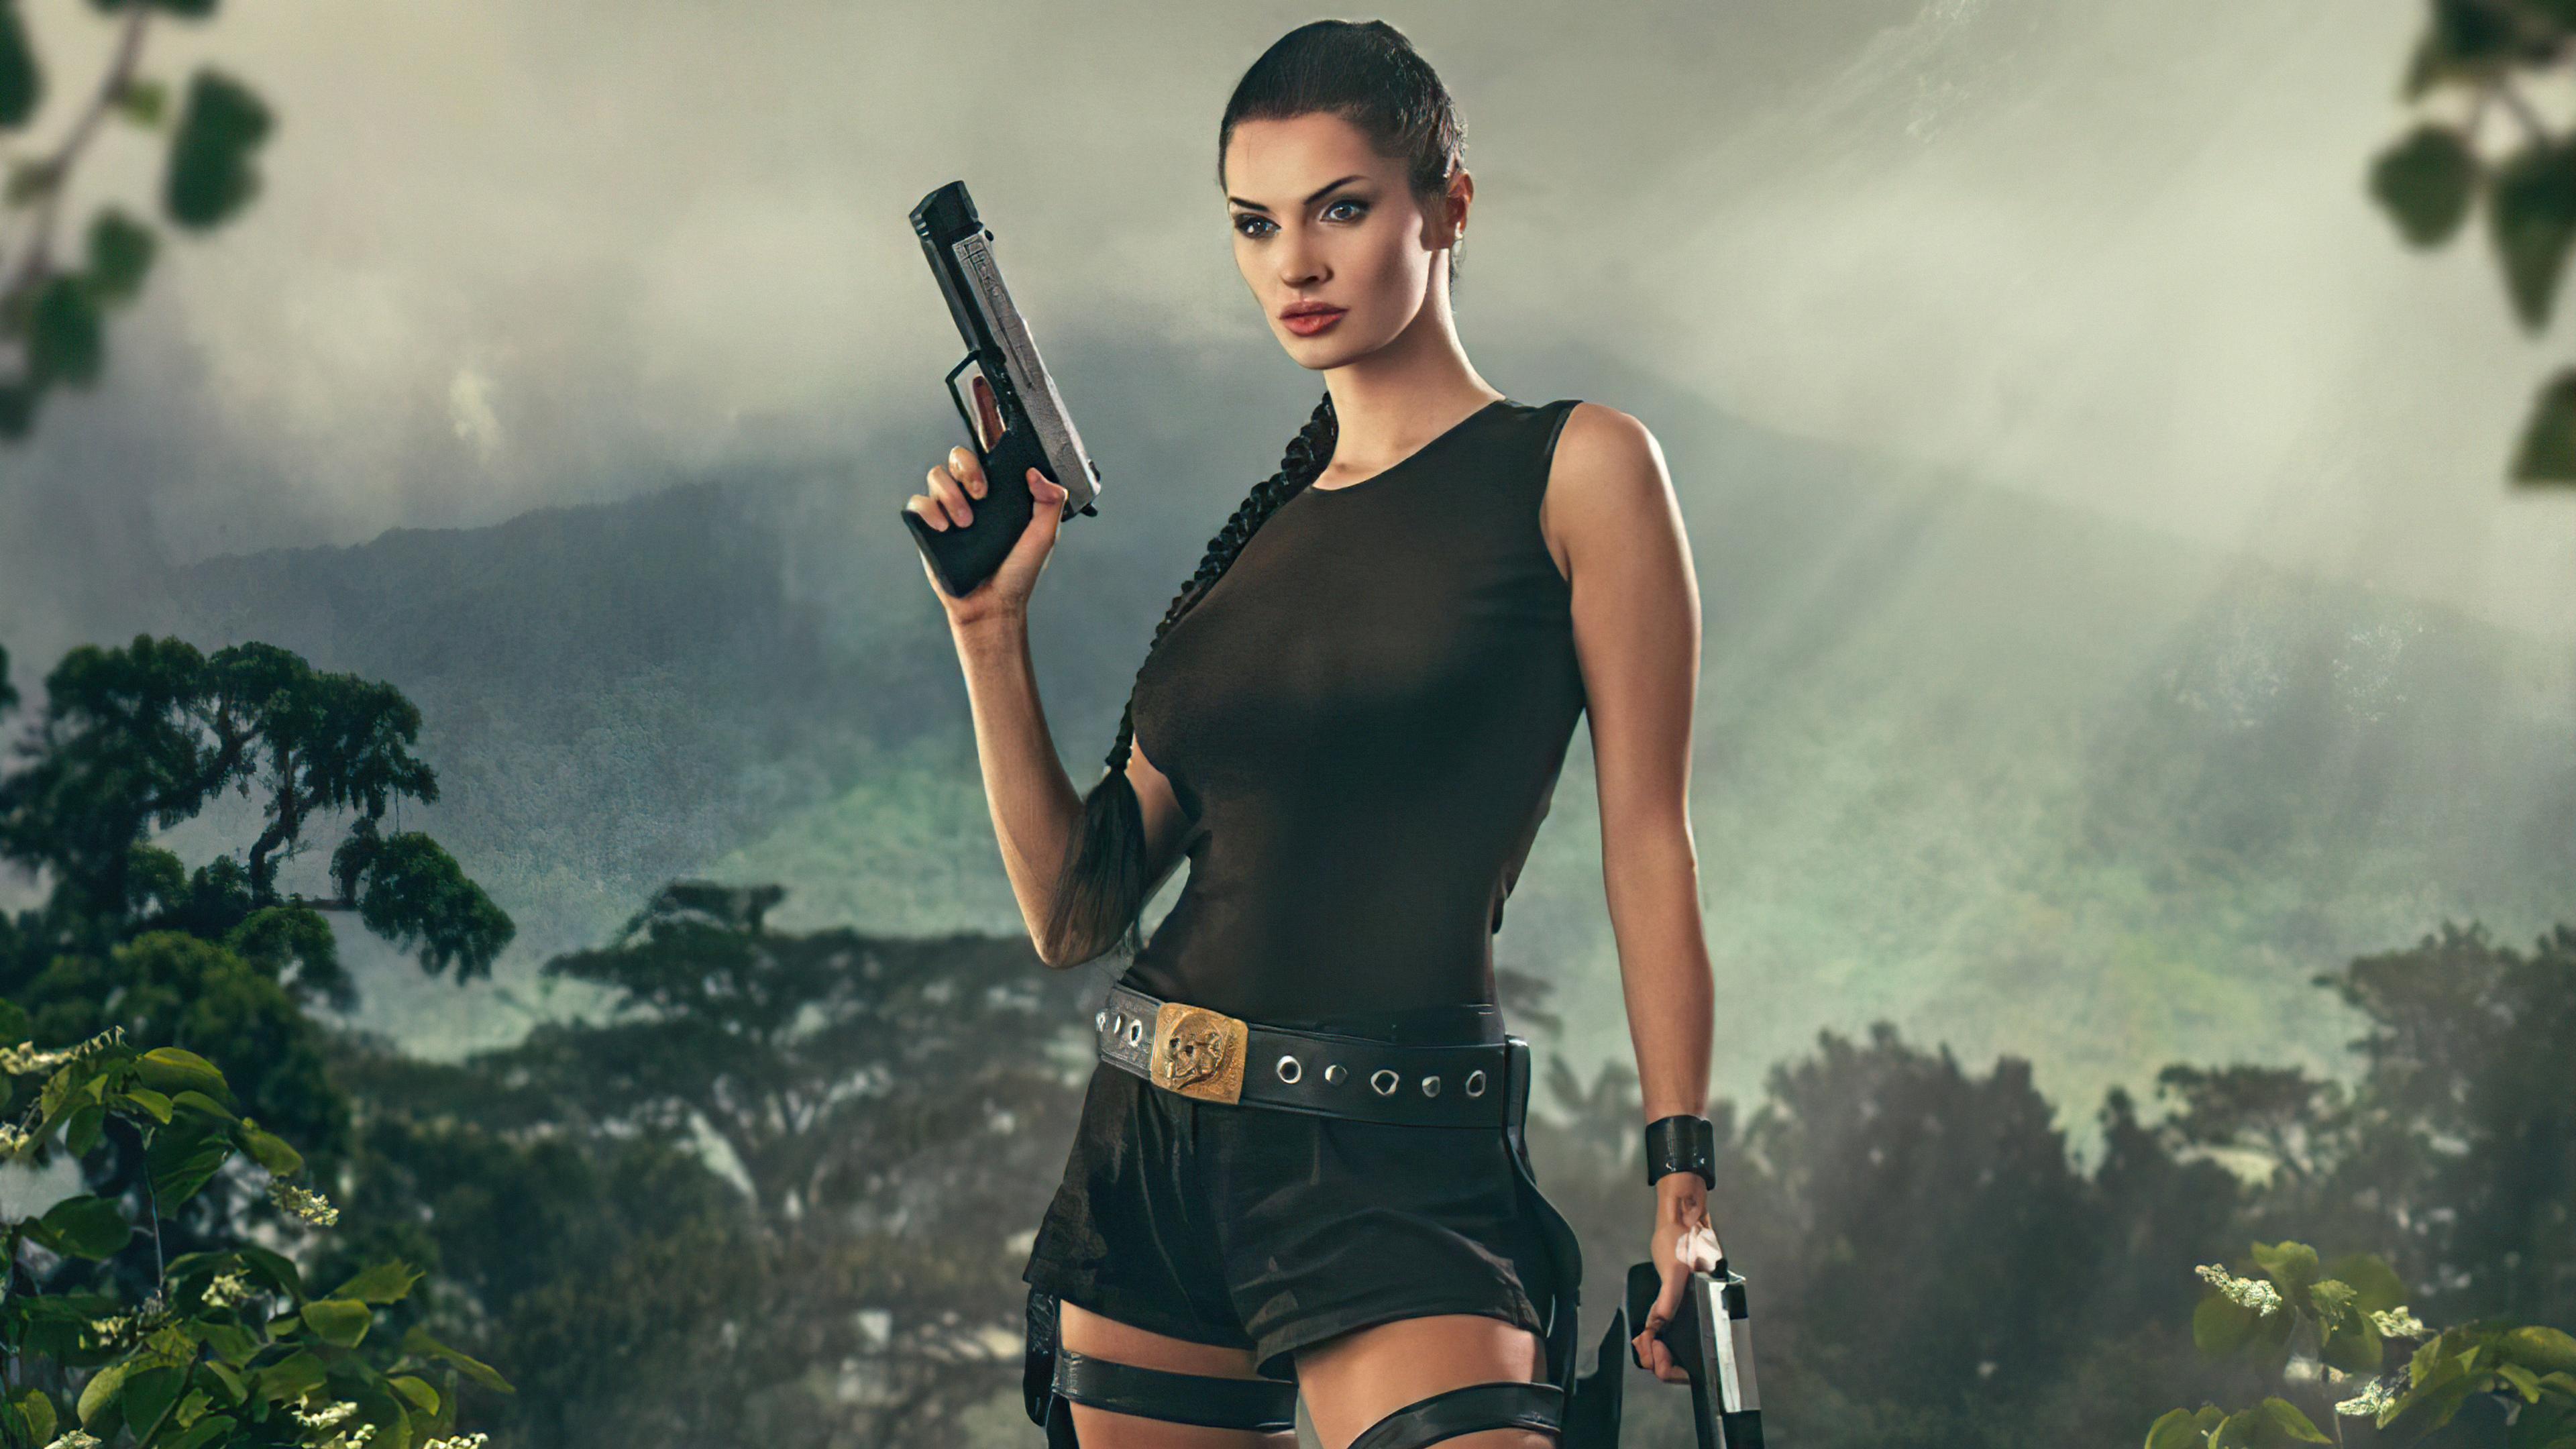 tombraider cosplay girl 4k 1615132298 - Tombraider Cosplay Girl 4k - Tombraider Cosplay Girl 4k wallpapers